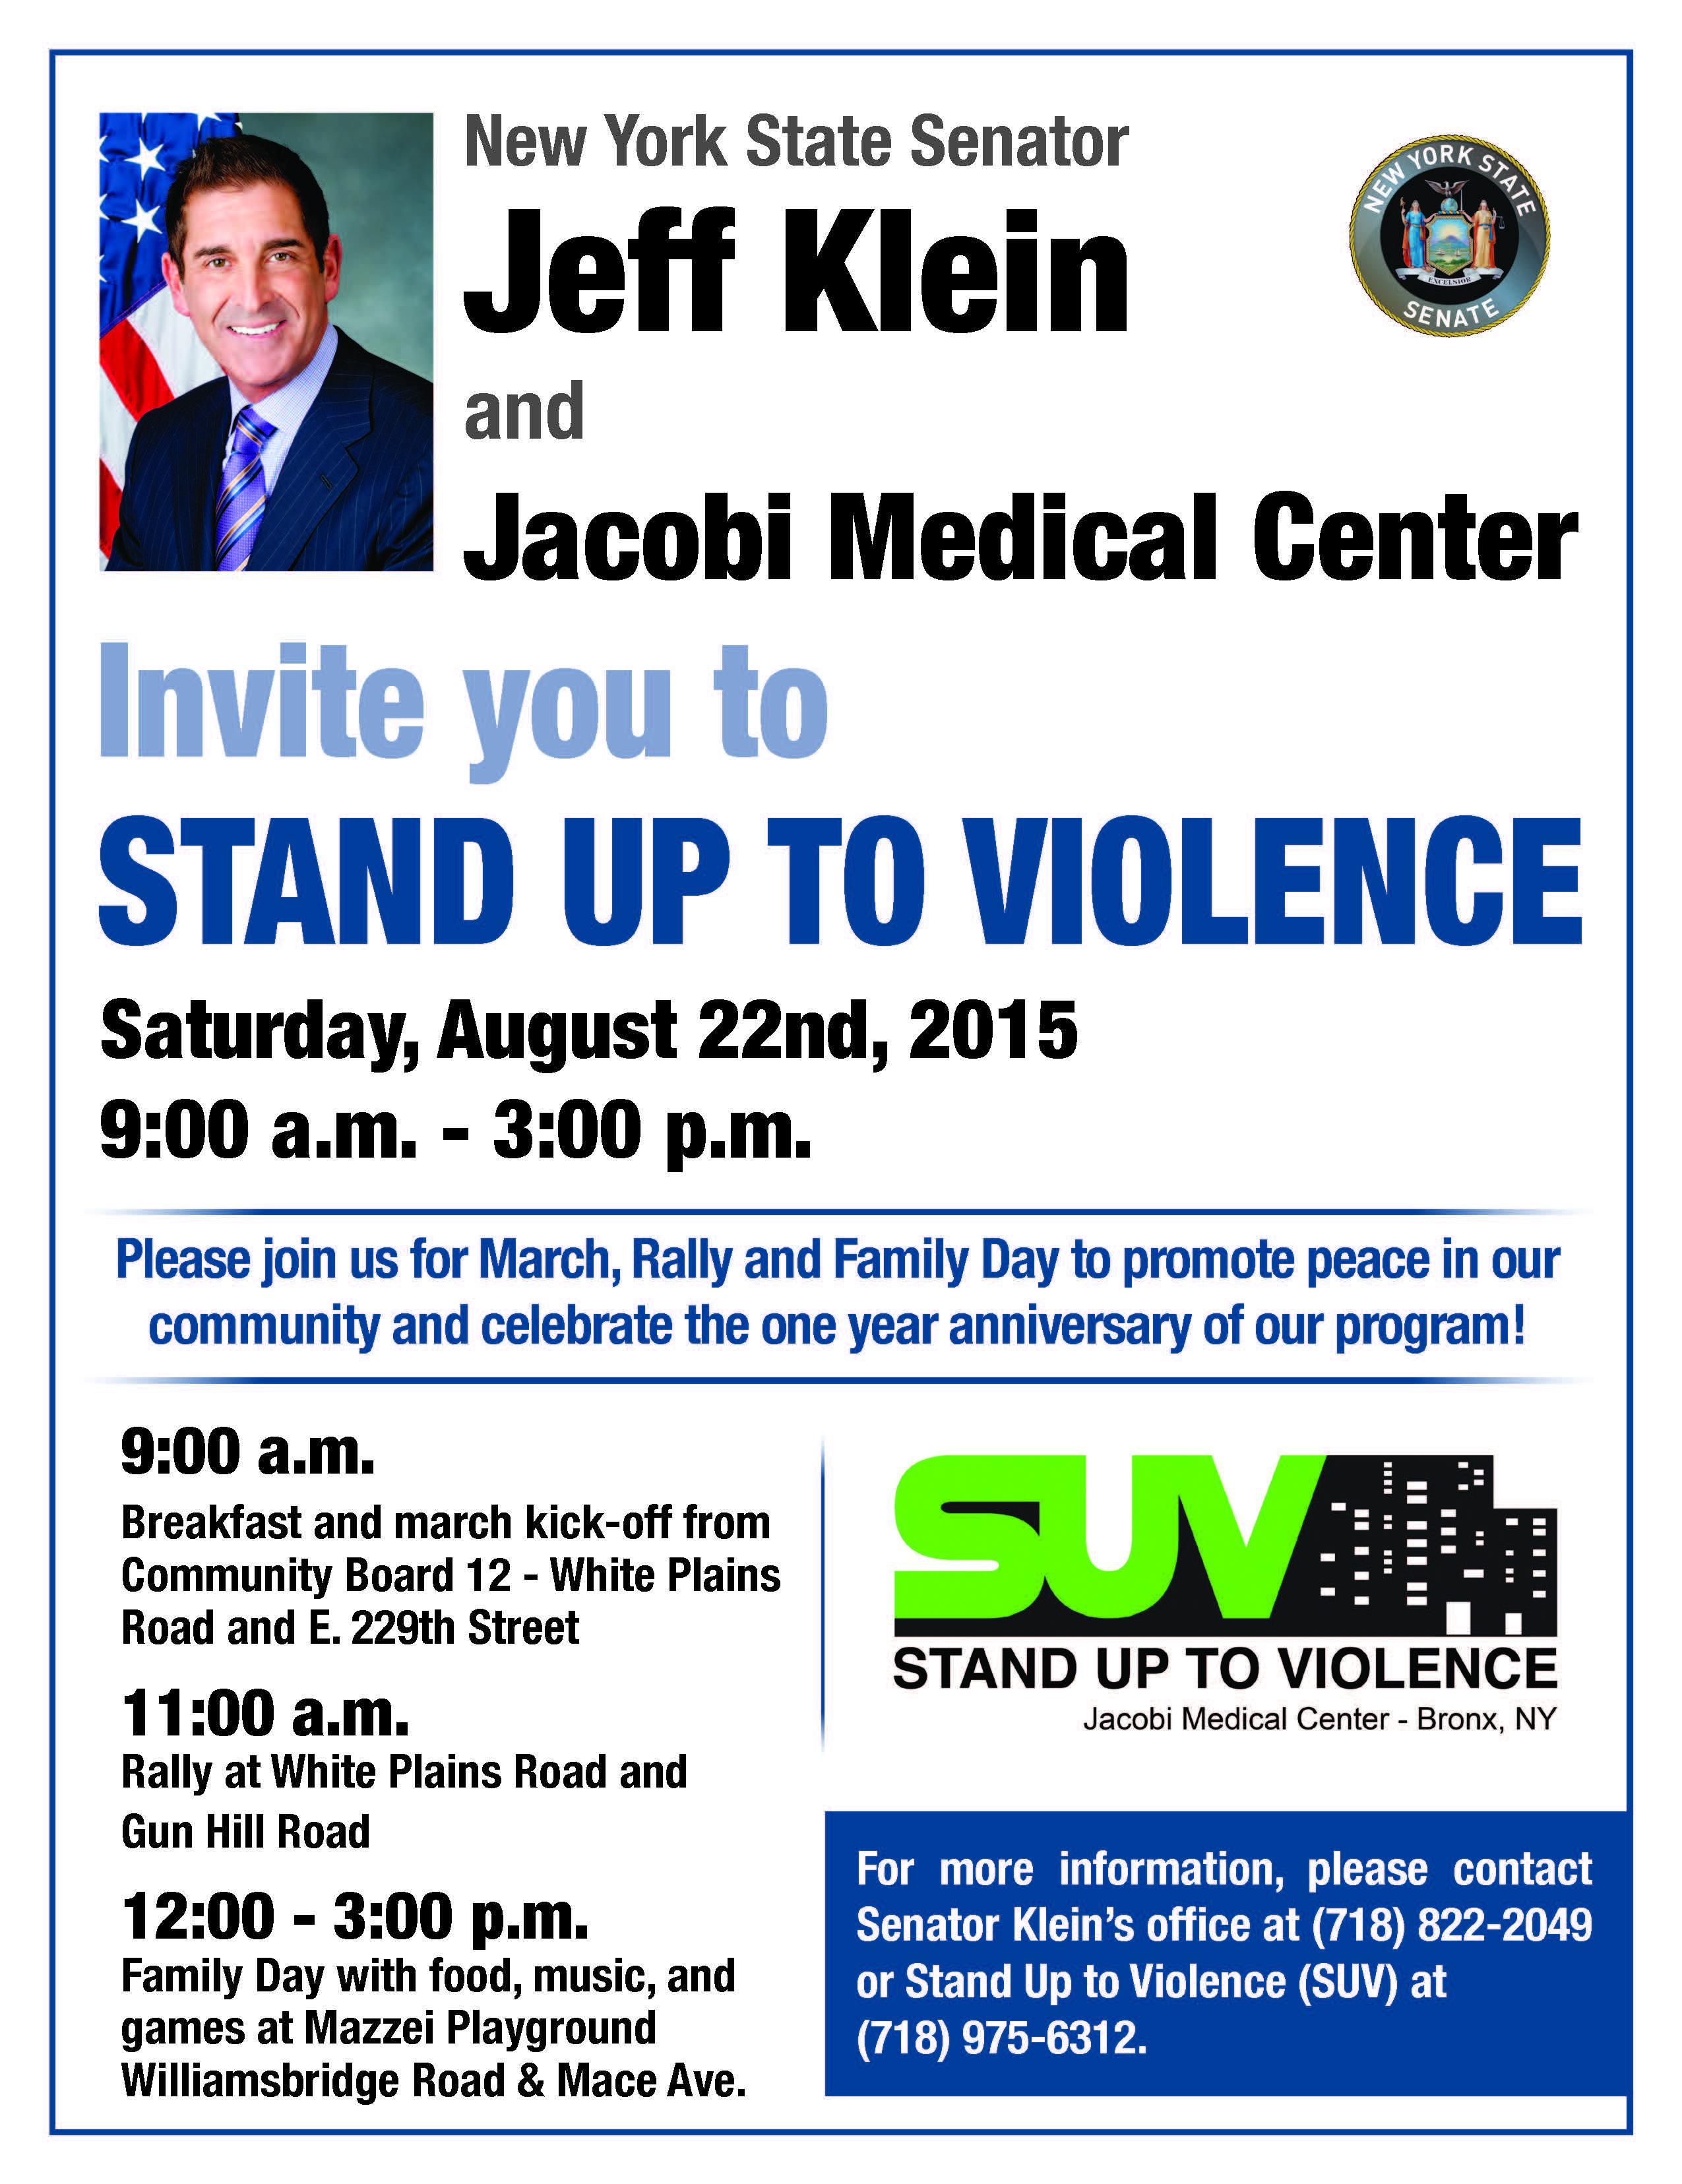 Senator Klein & Jacobi Medical Center –  Stand Up To Violence August 22nd